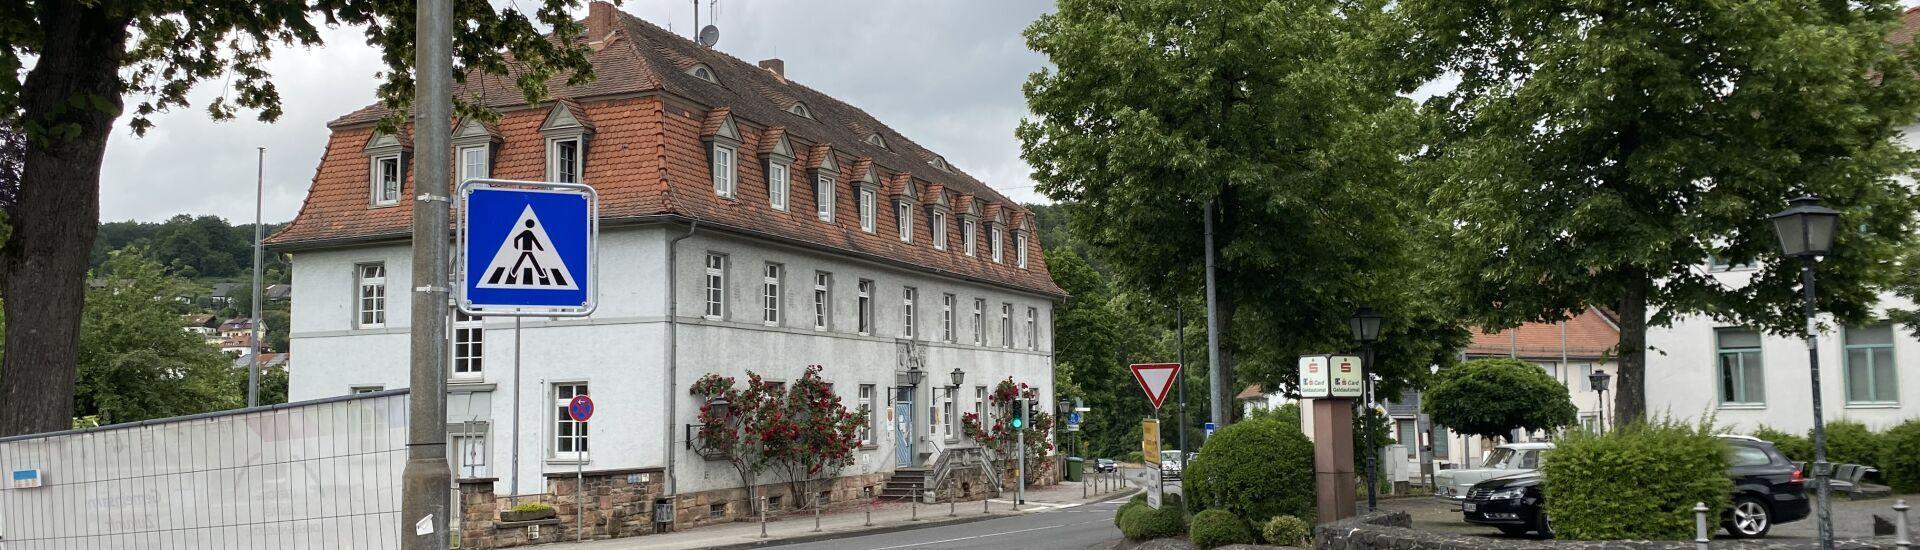 Rathaus Ortenberg